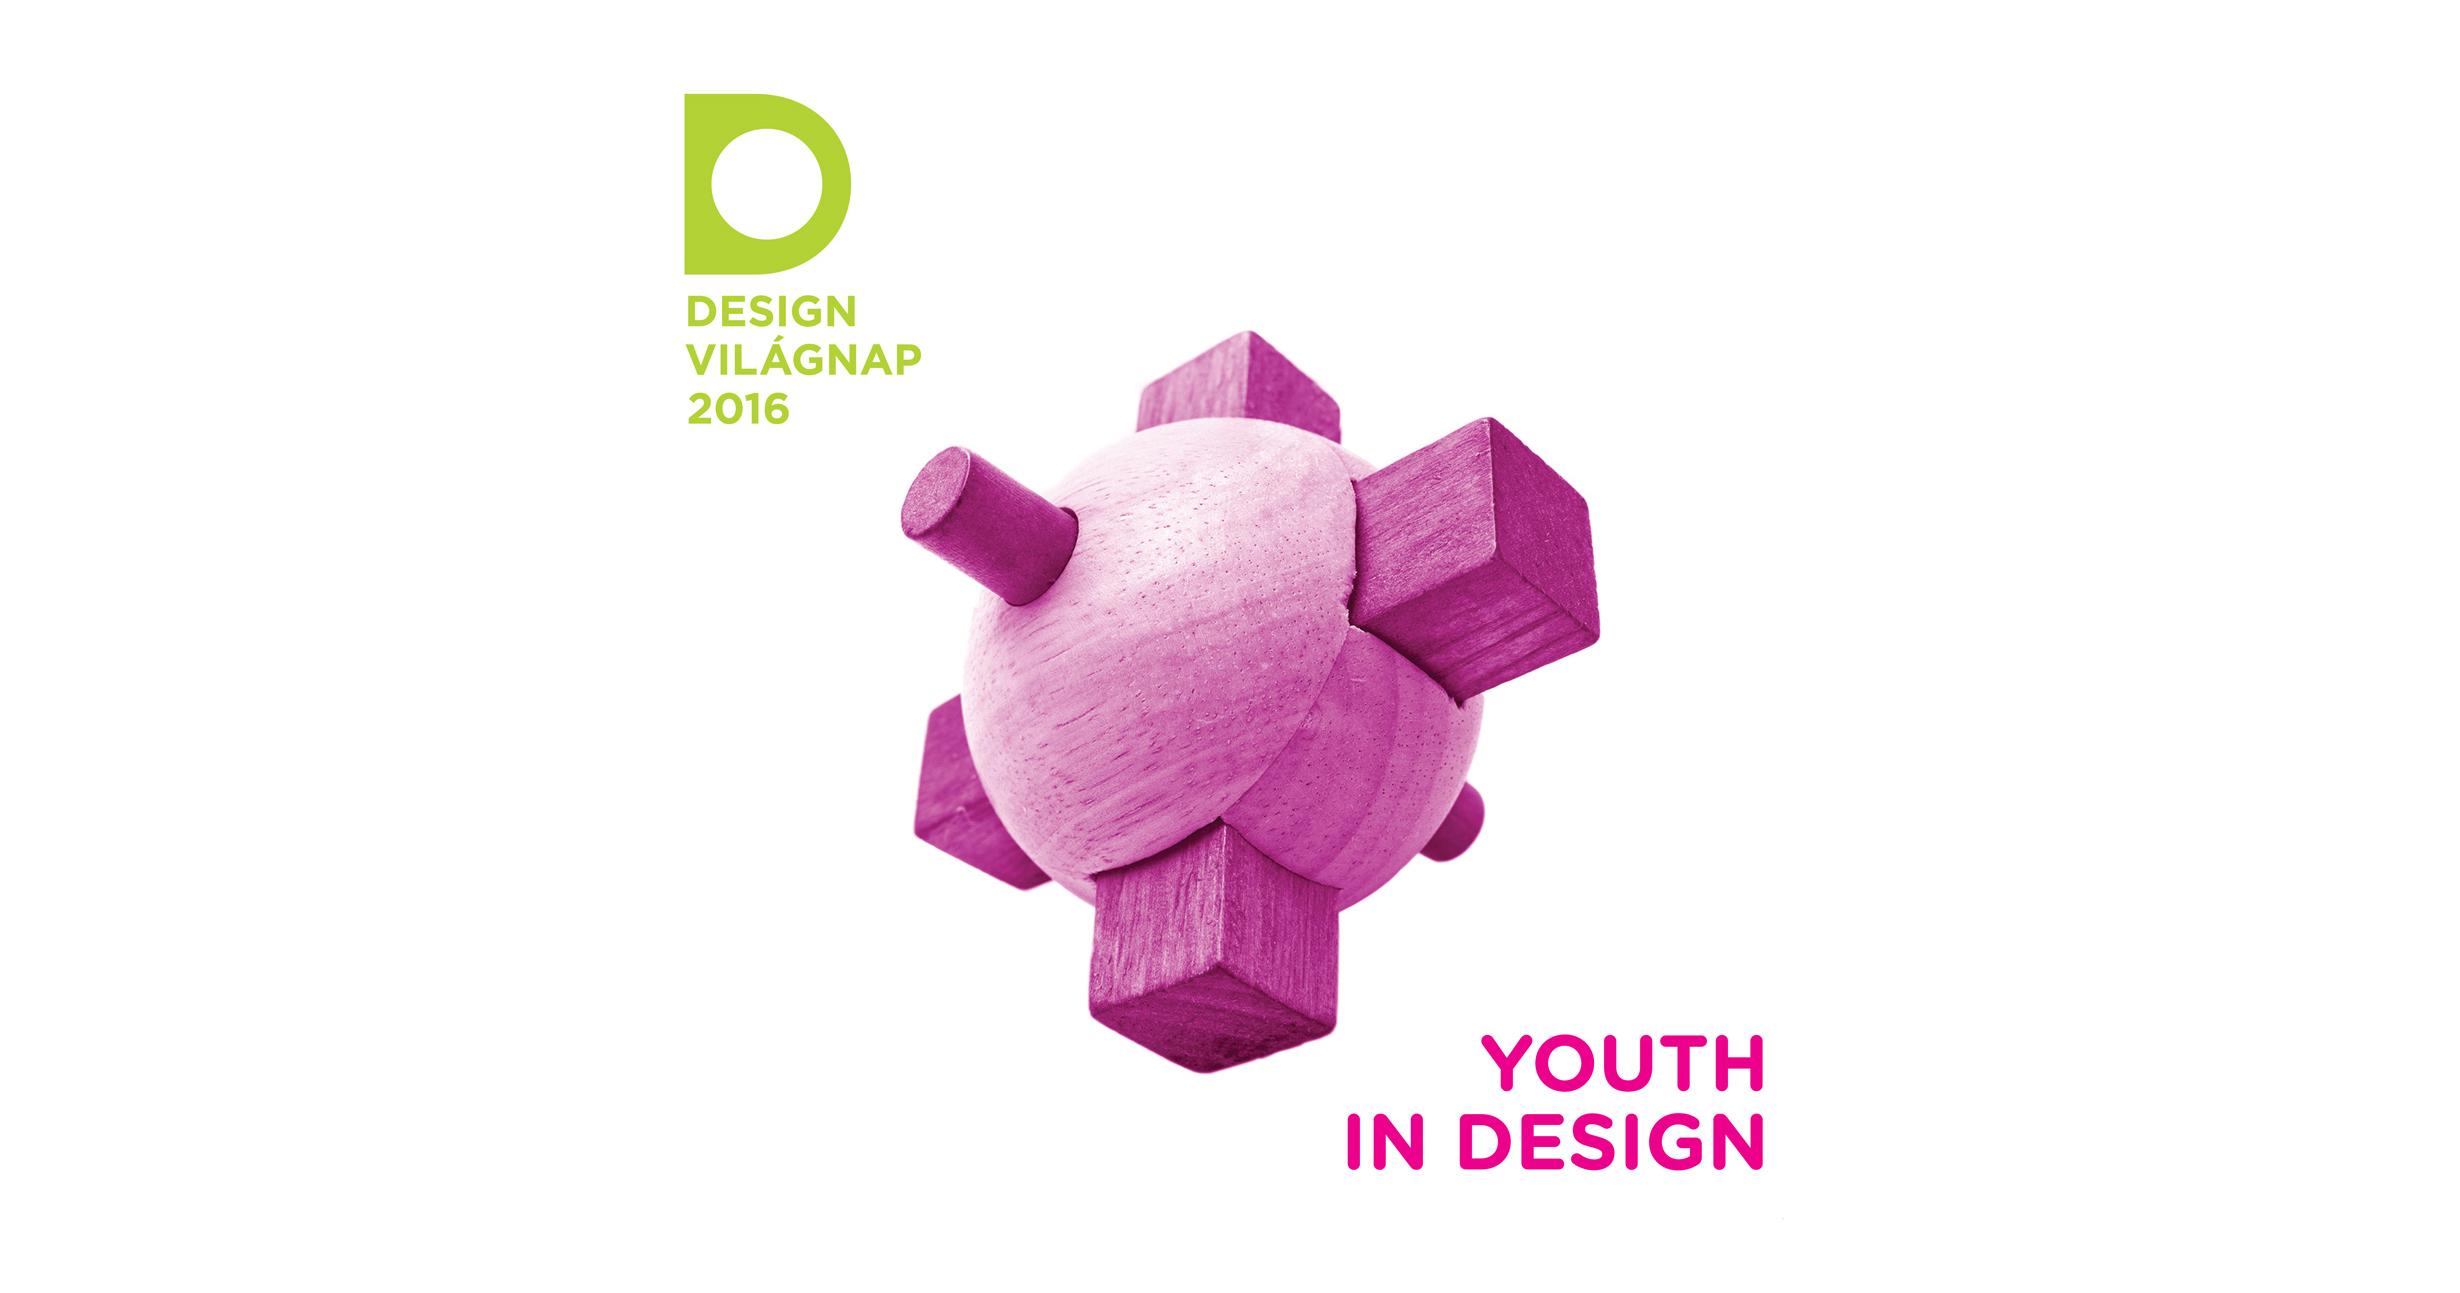 designvilagnap2016_web_ooo